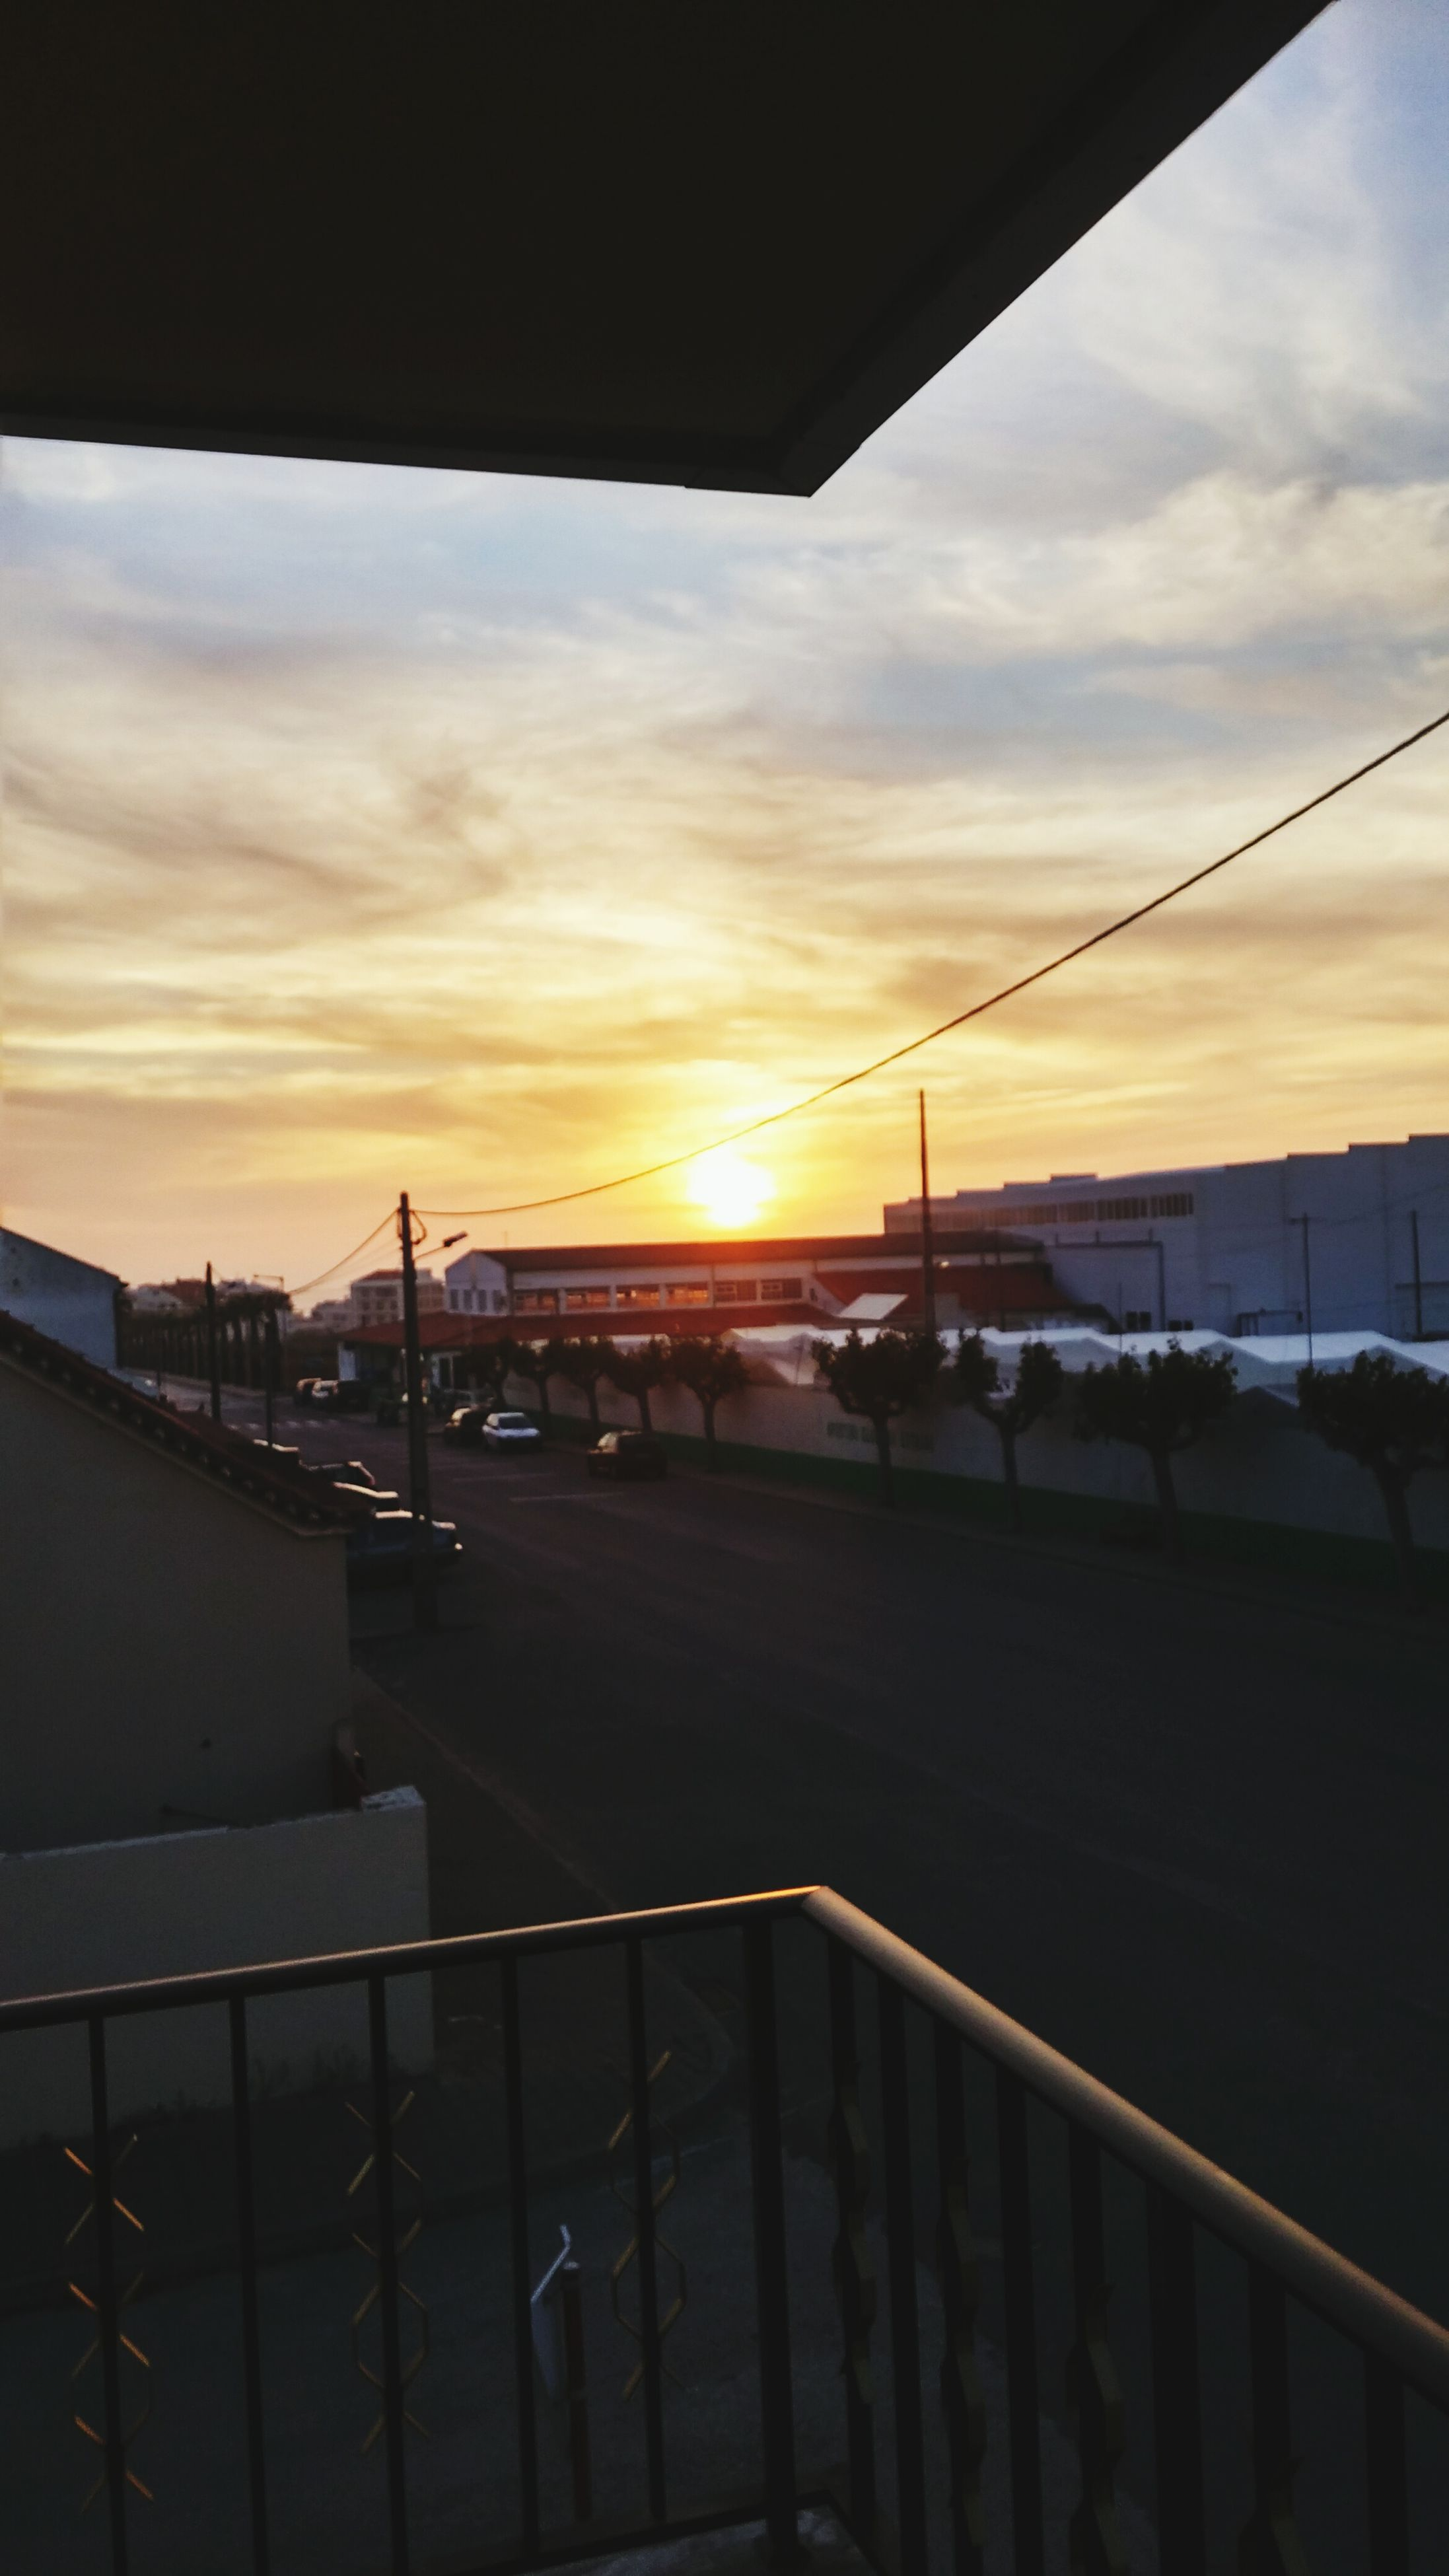 sunset, sky, sun, transportation, built structure, silhouette, cloud - sky, orange color, sunlight, railing, architecture, cloud, connection, street light, empty, outdoors, railroad station platform, the way forward, no people, bridge - man made structure